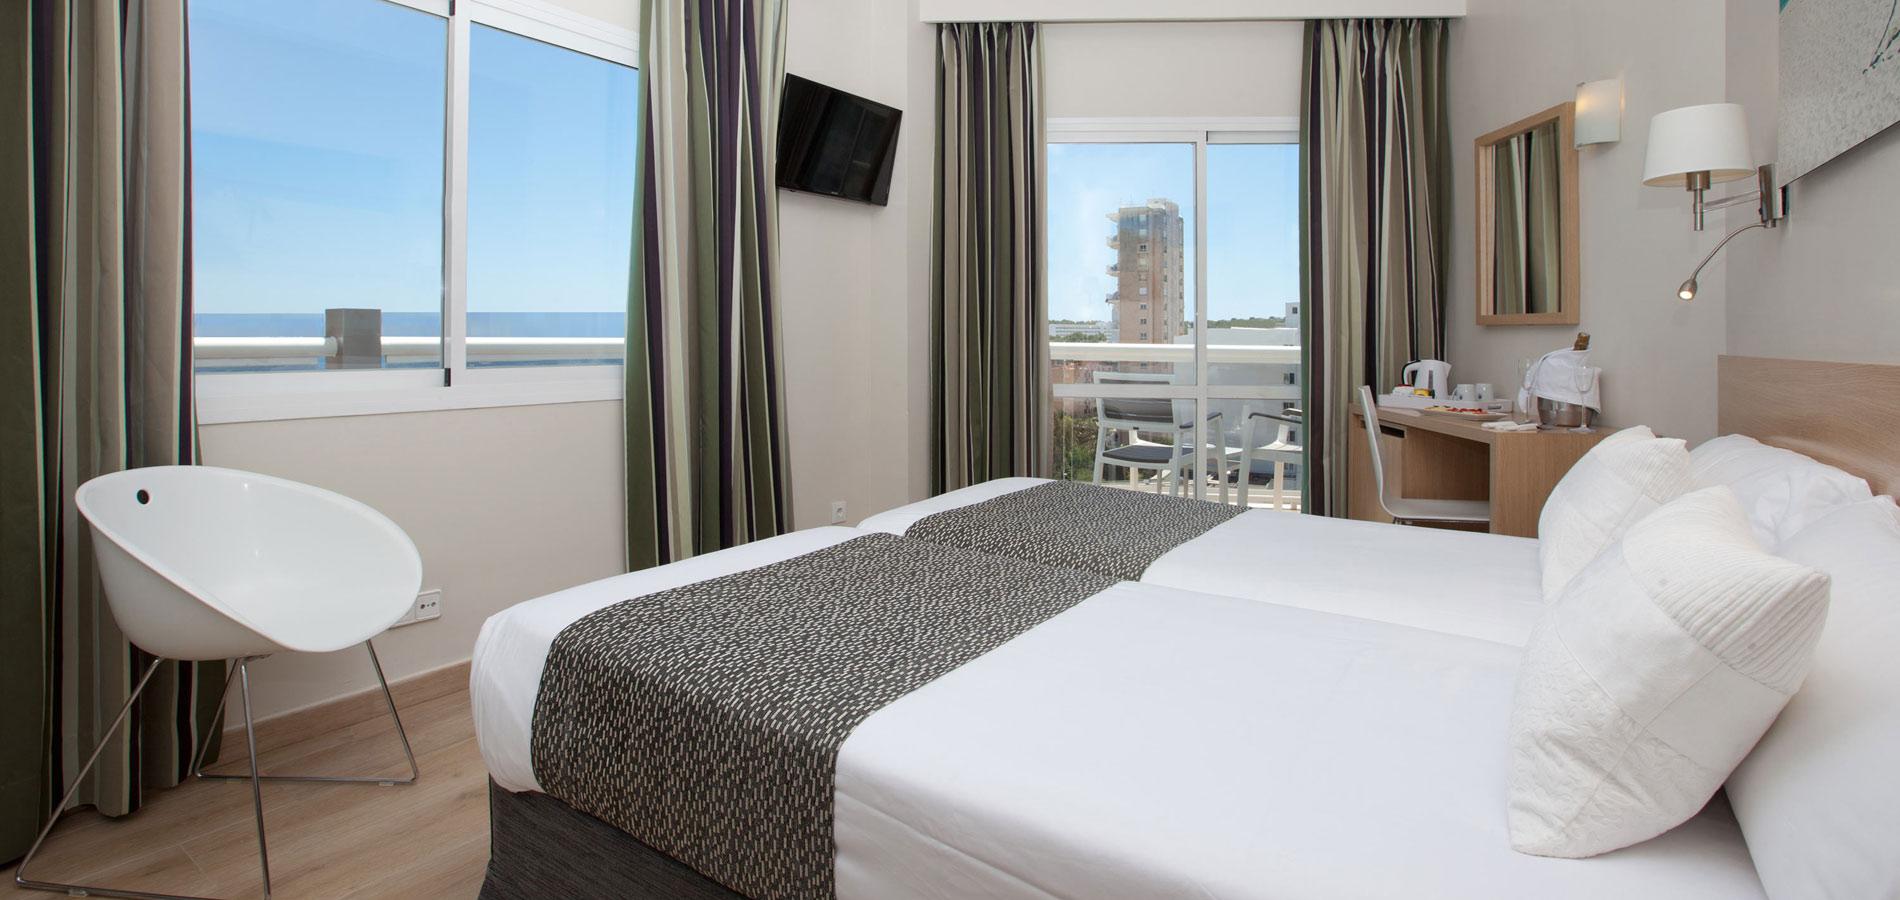 Hotel Samos Rooms